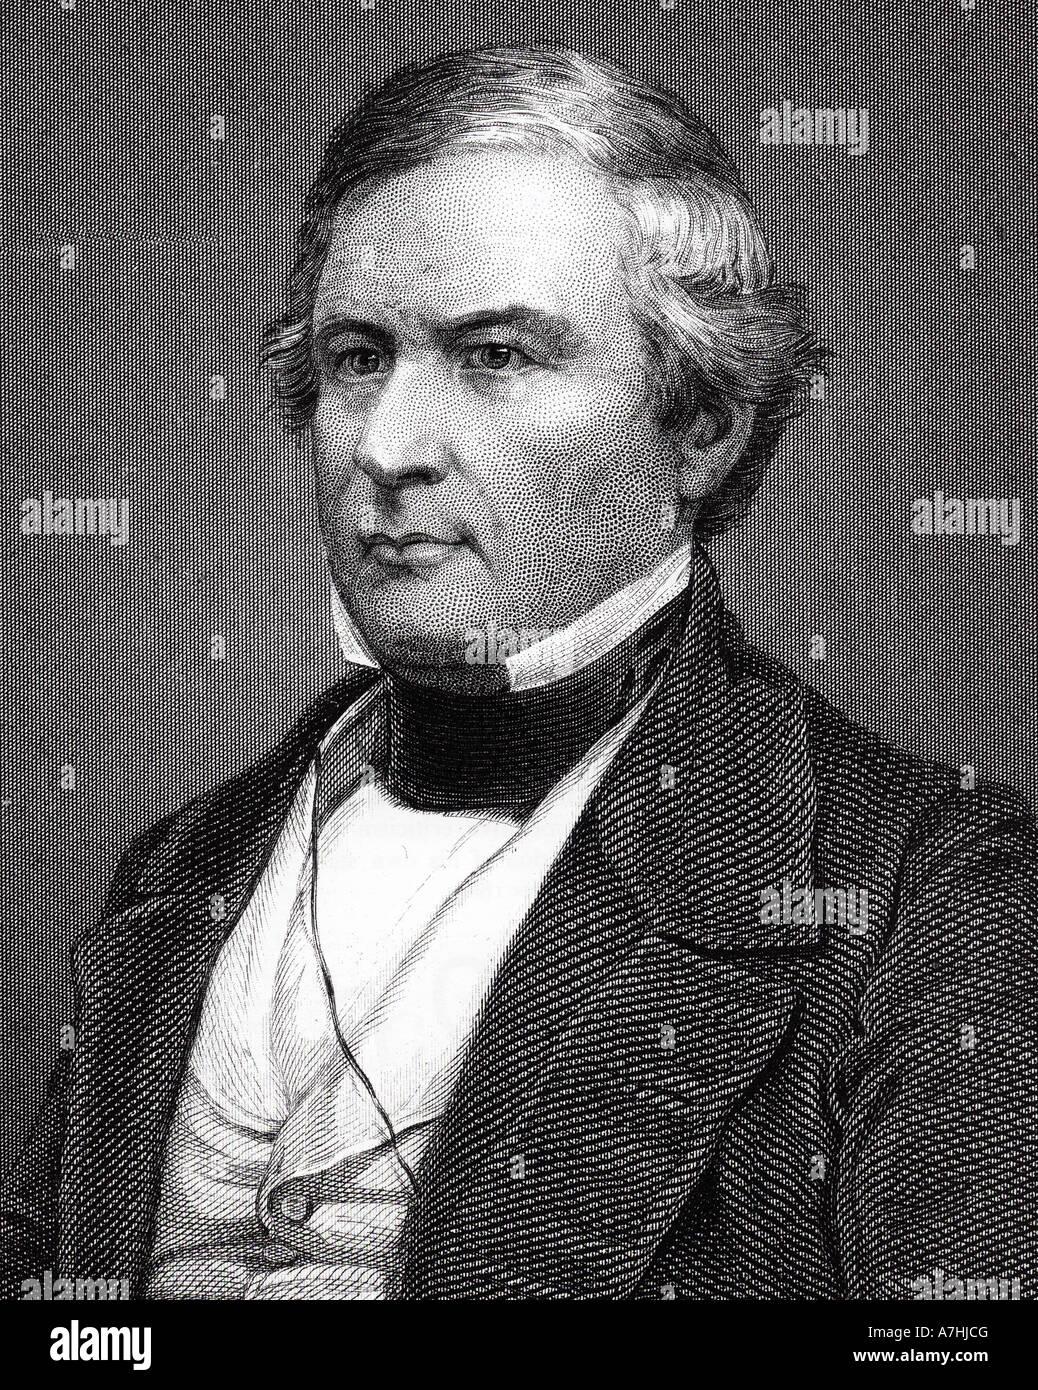 MILLARD FILLMORE  - 13th President of the USA (1800-1874) - Stock Image